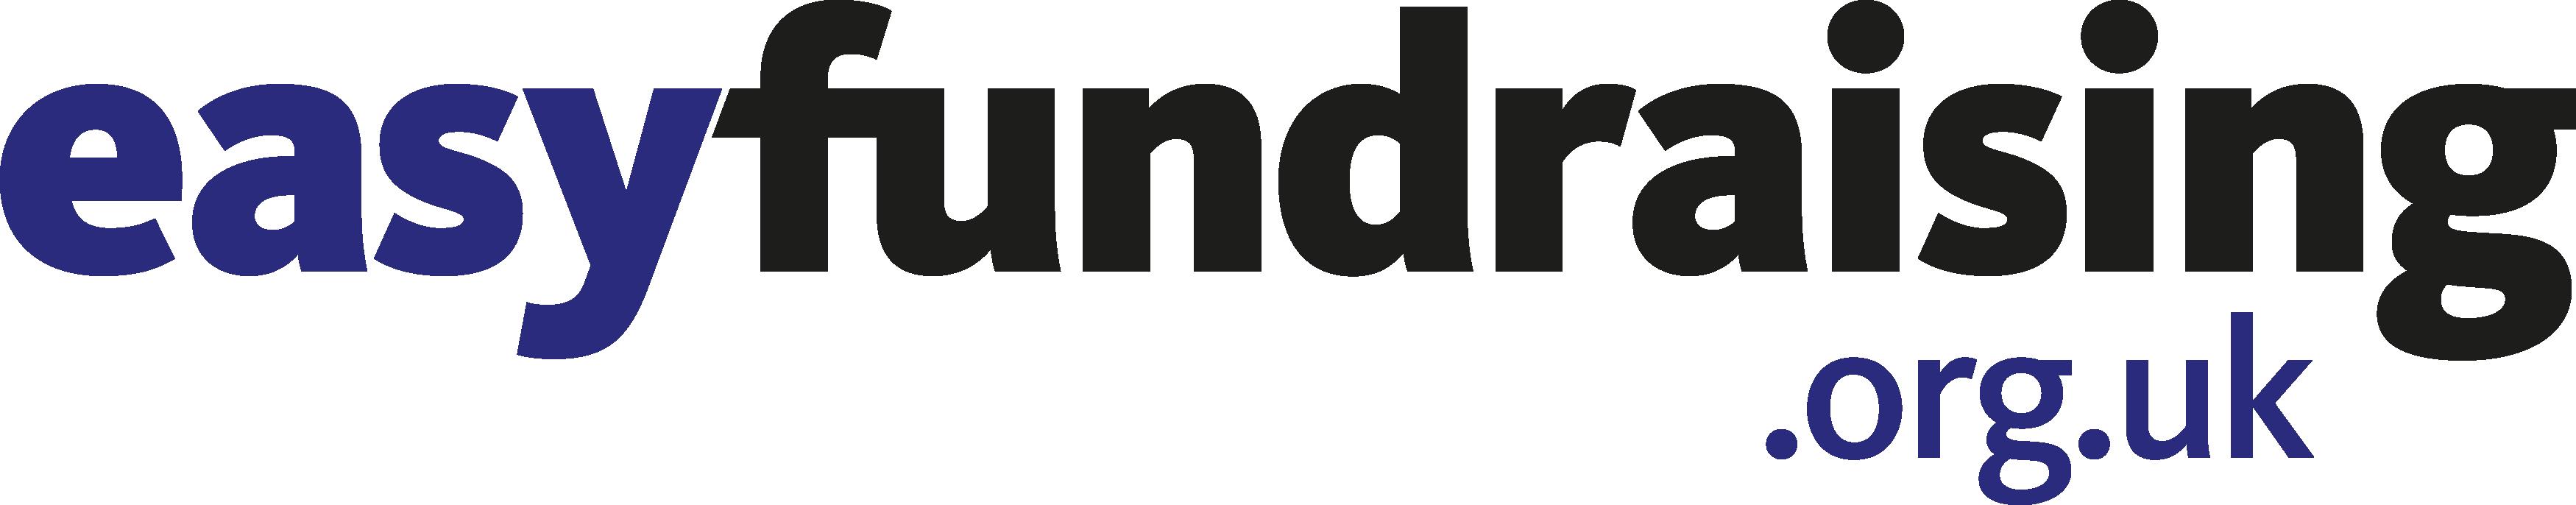 easyfundraising-logo (2)